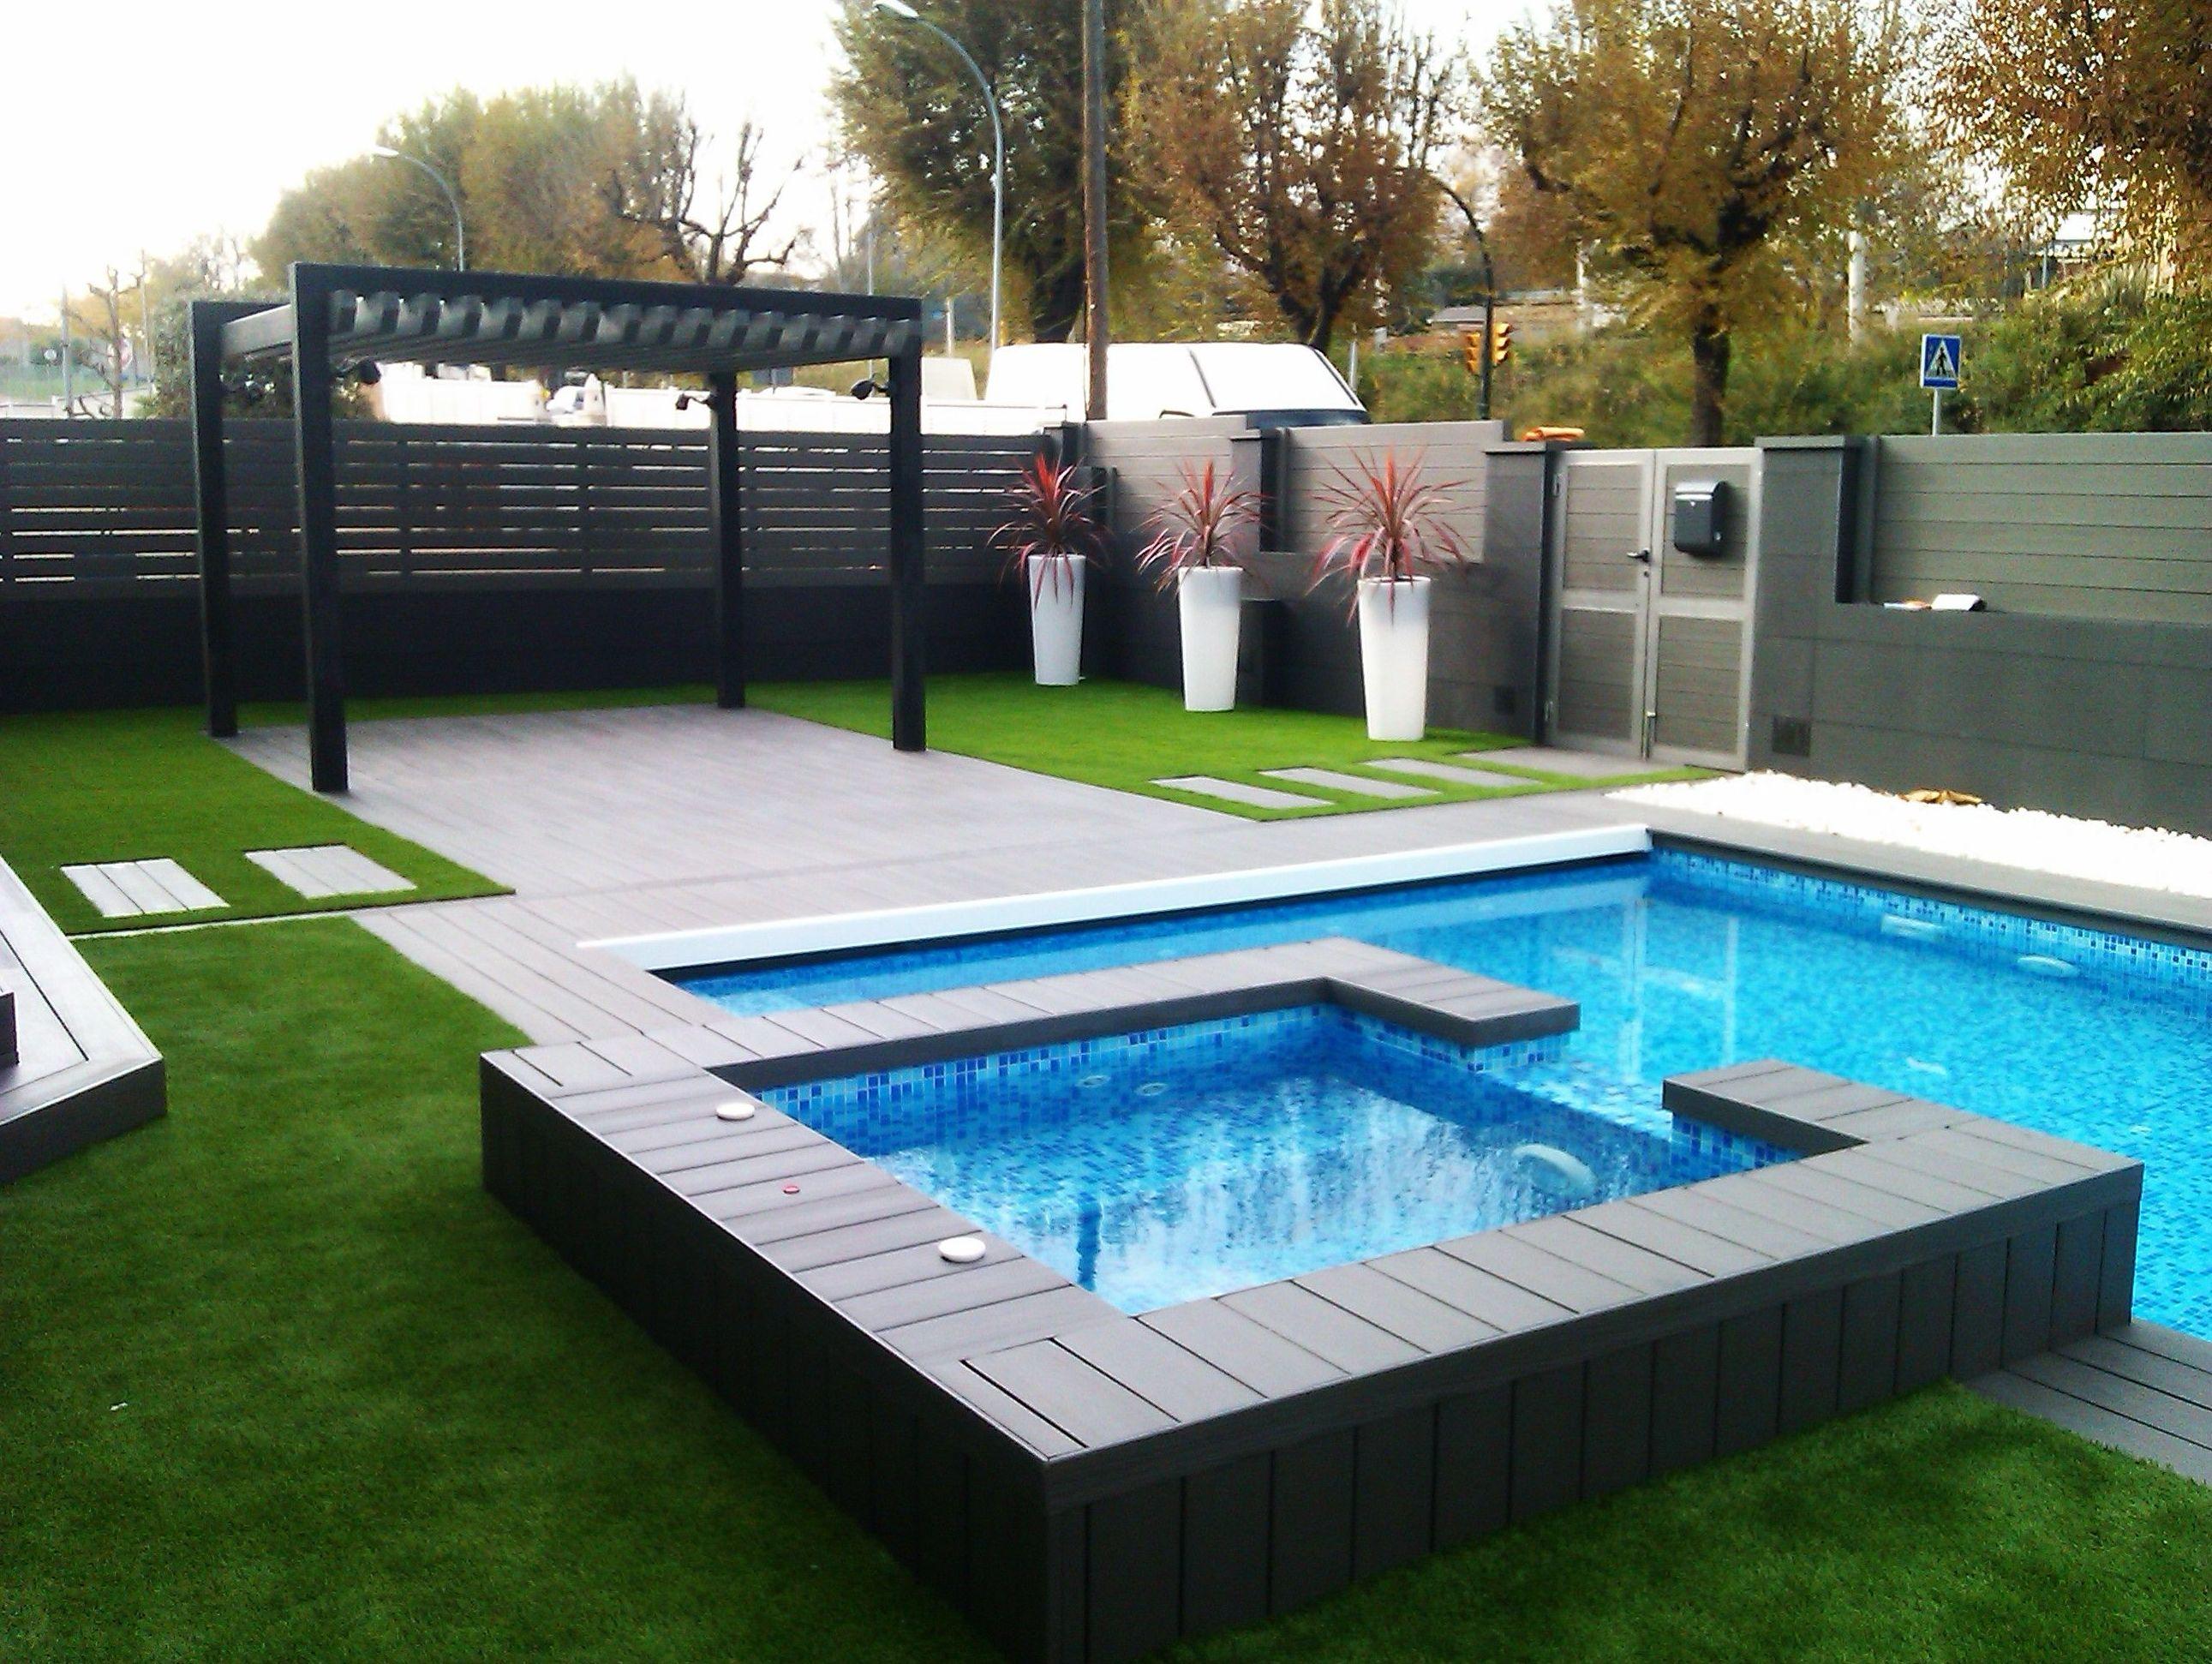 construcci n de piscinas huelva